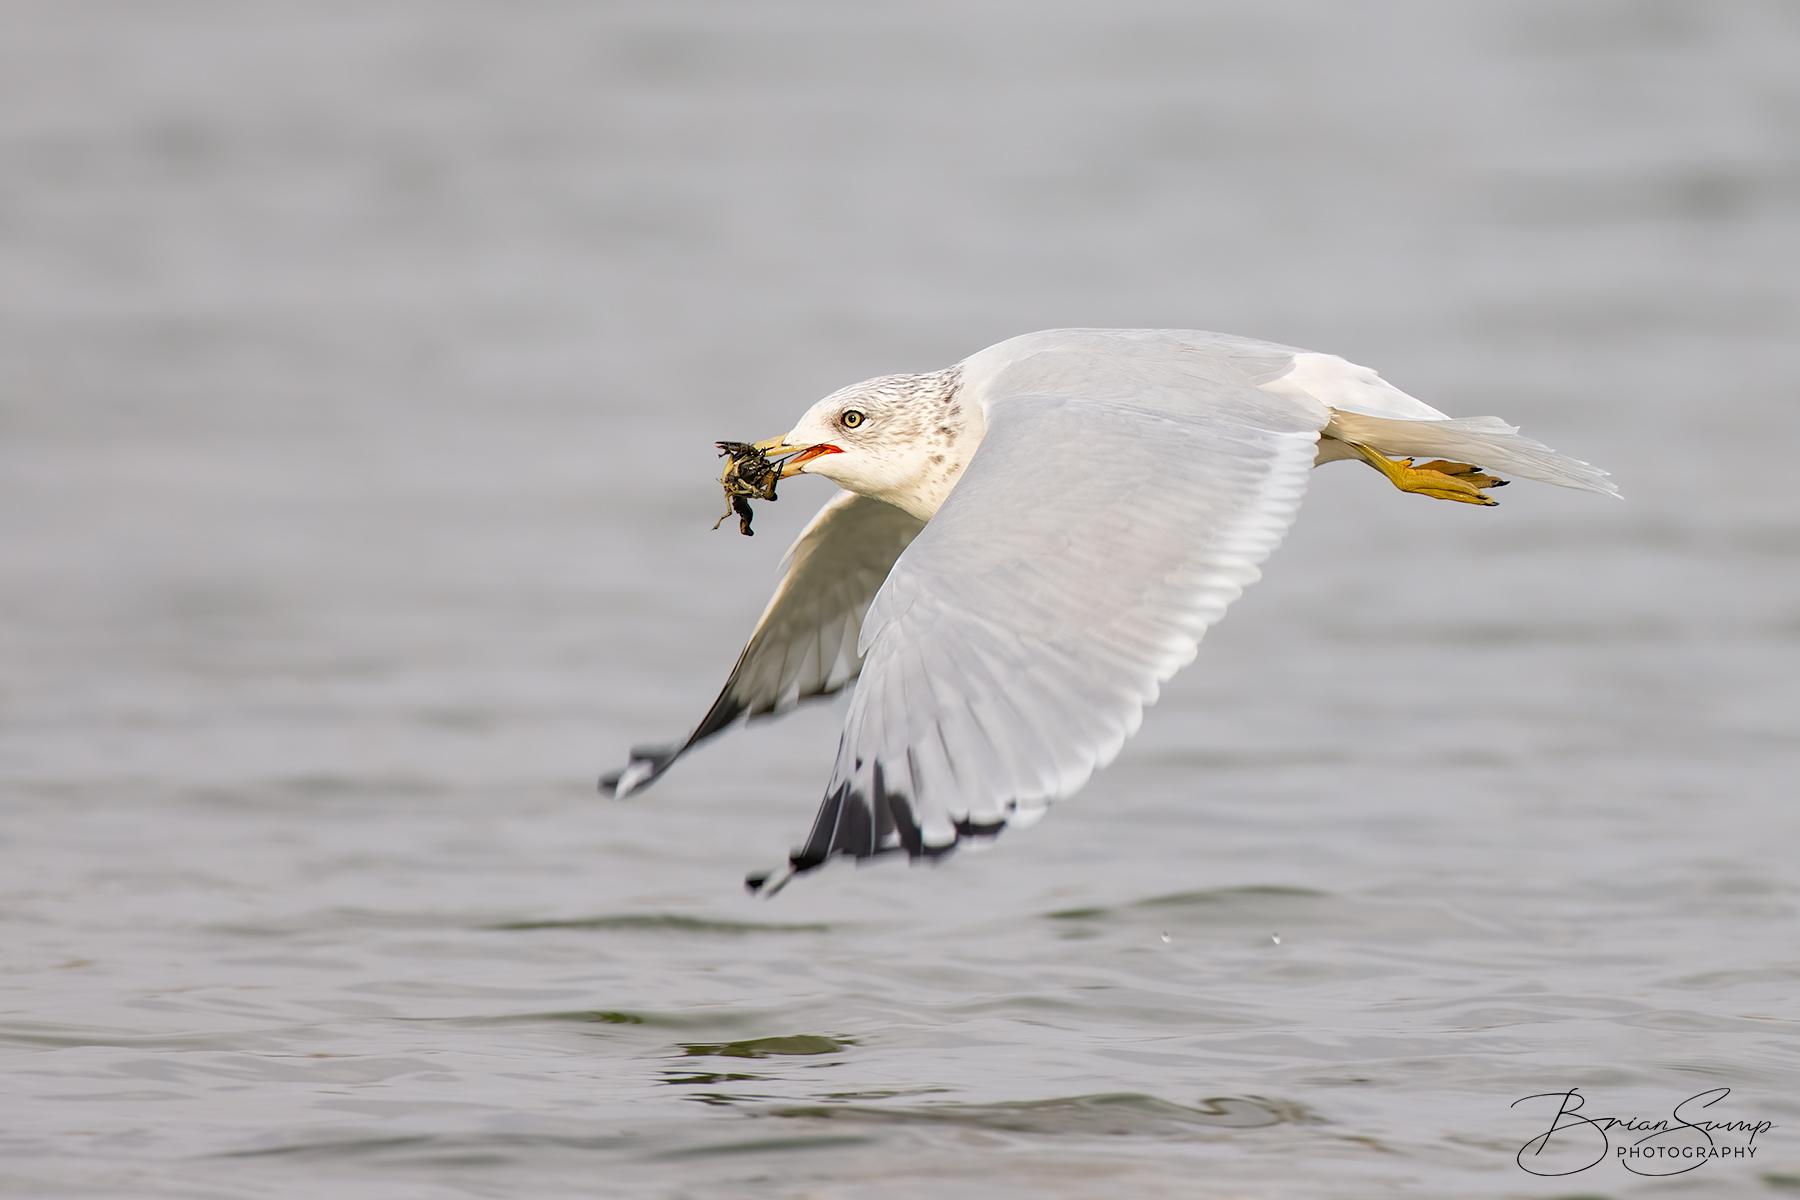 Name:  20201020-Gull-crawdad-wingsdown-Brian-Sump-BMS_9533-2-FORUM-SIG-USM170-touch-craw.jpg Views: 153 Size:  518.7 KB